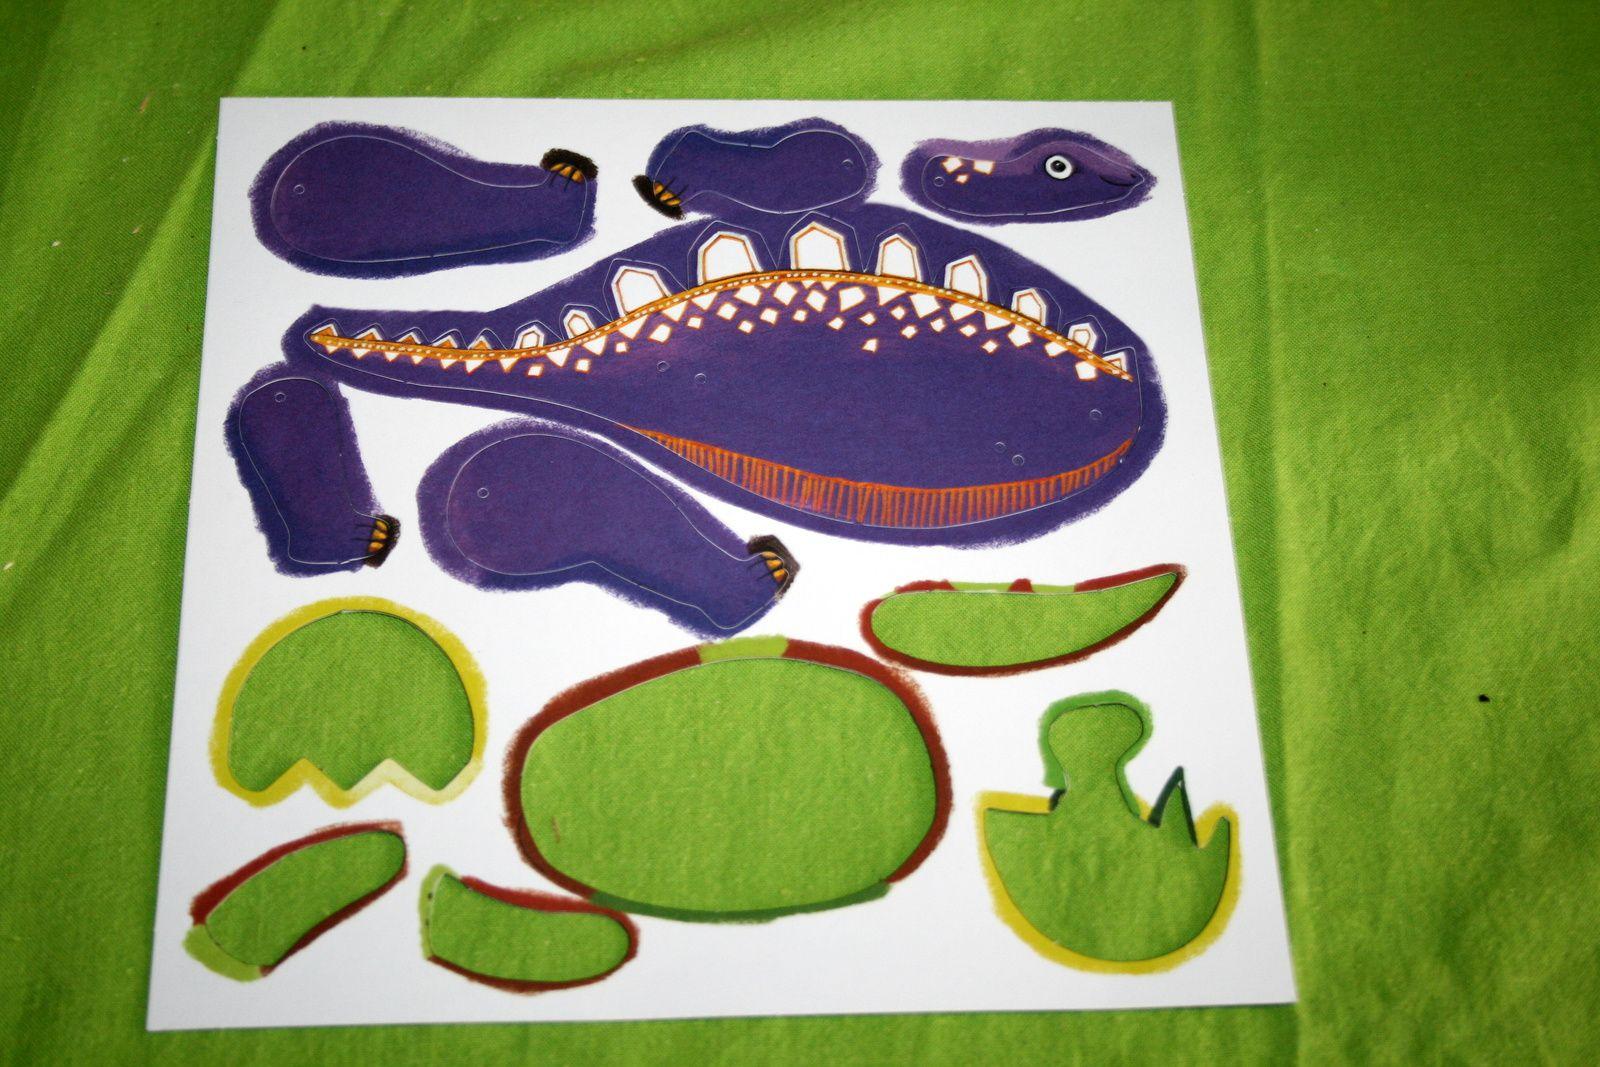 #kit #dinosaure #marionnette #pantin #djeco #charlotteblabla blog